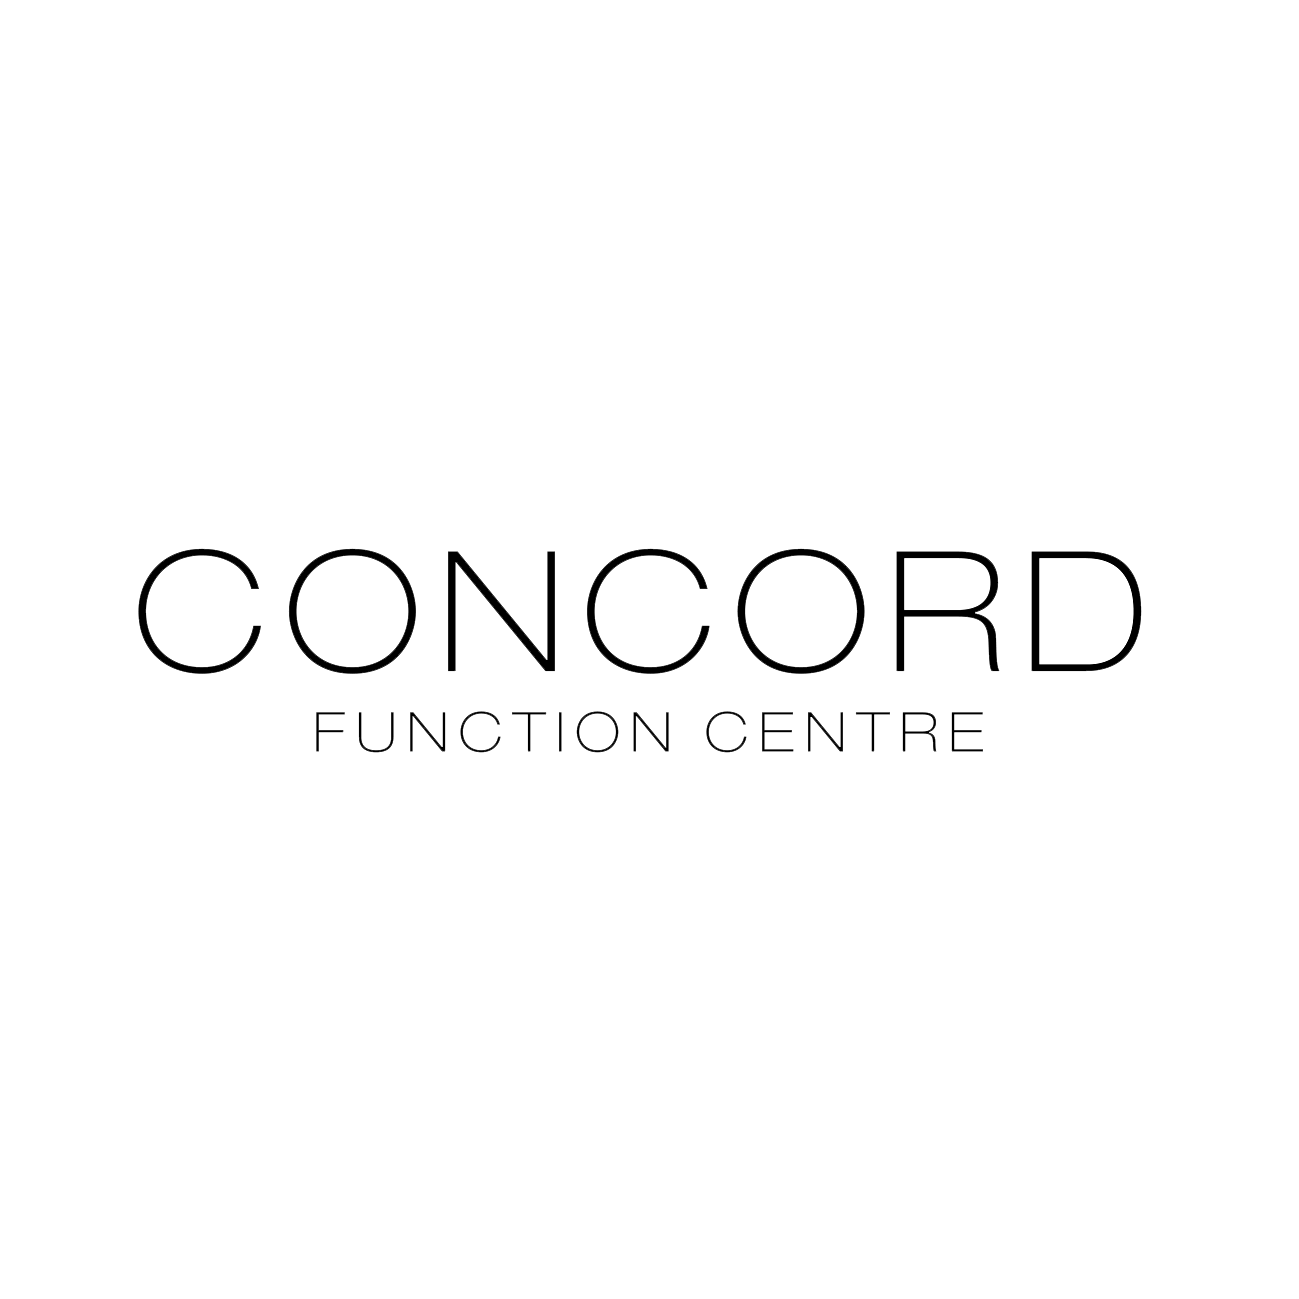 Concord Function Centre